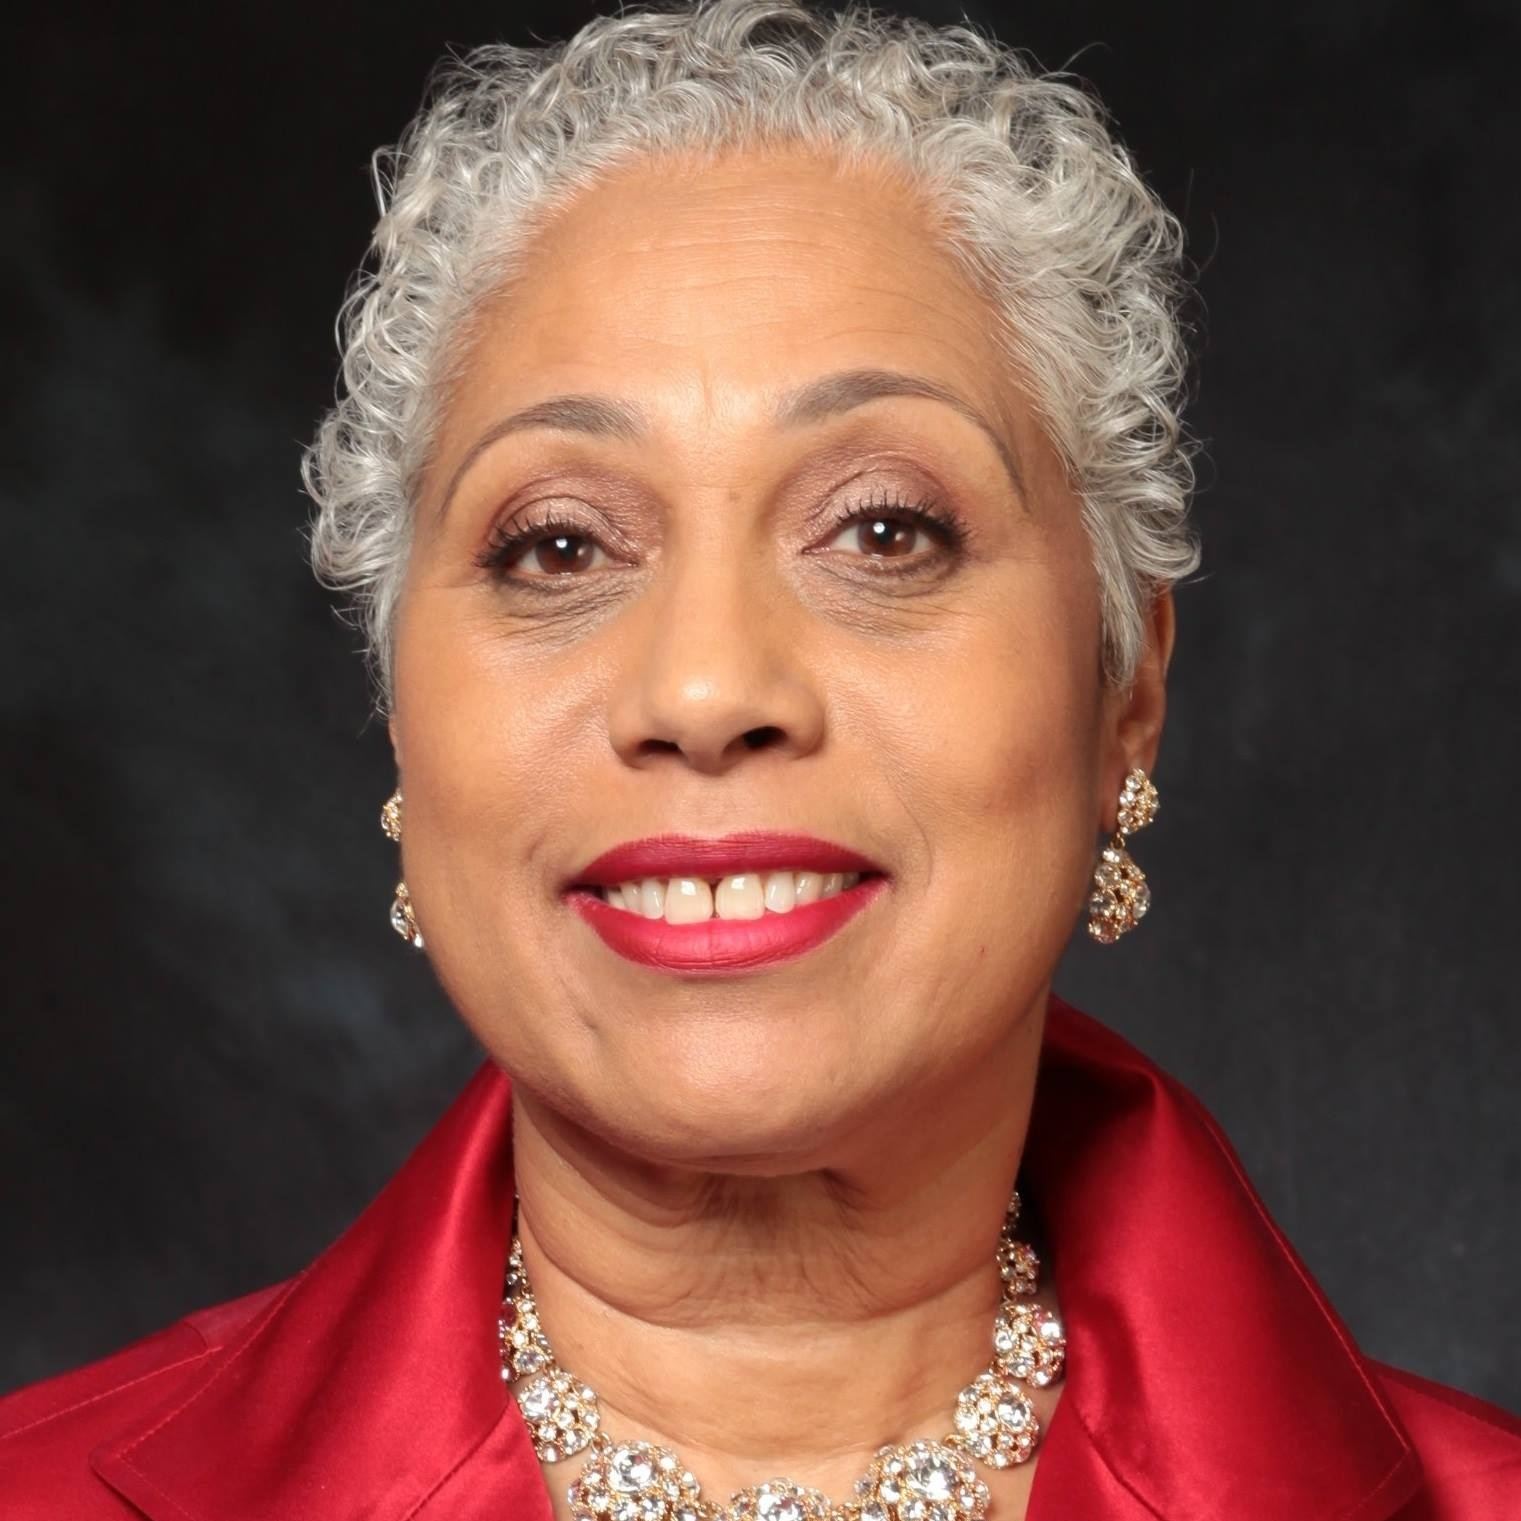 Ruth D. Hunt - Past Director, Community Affairs, Bellevue Hospital